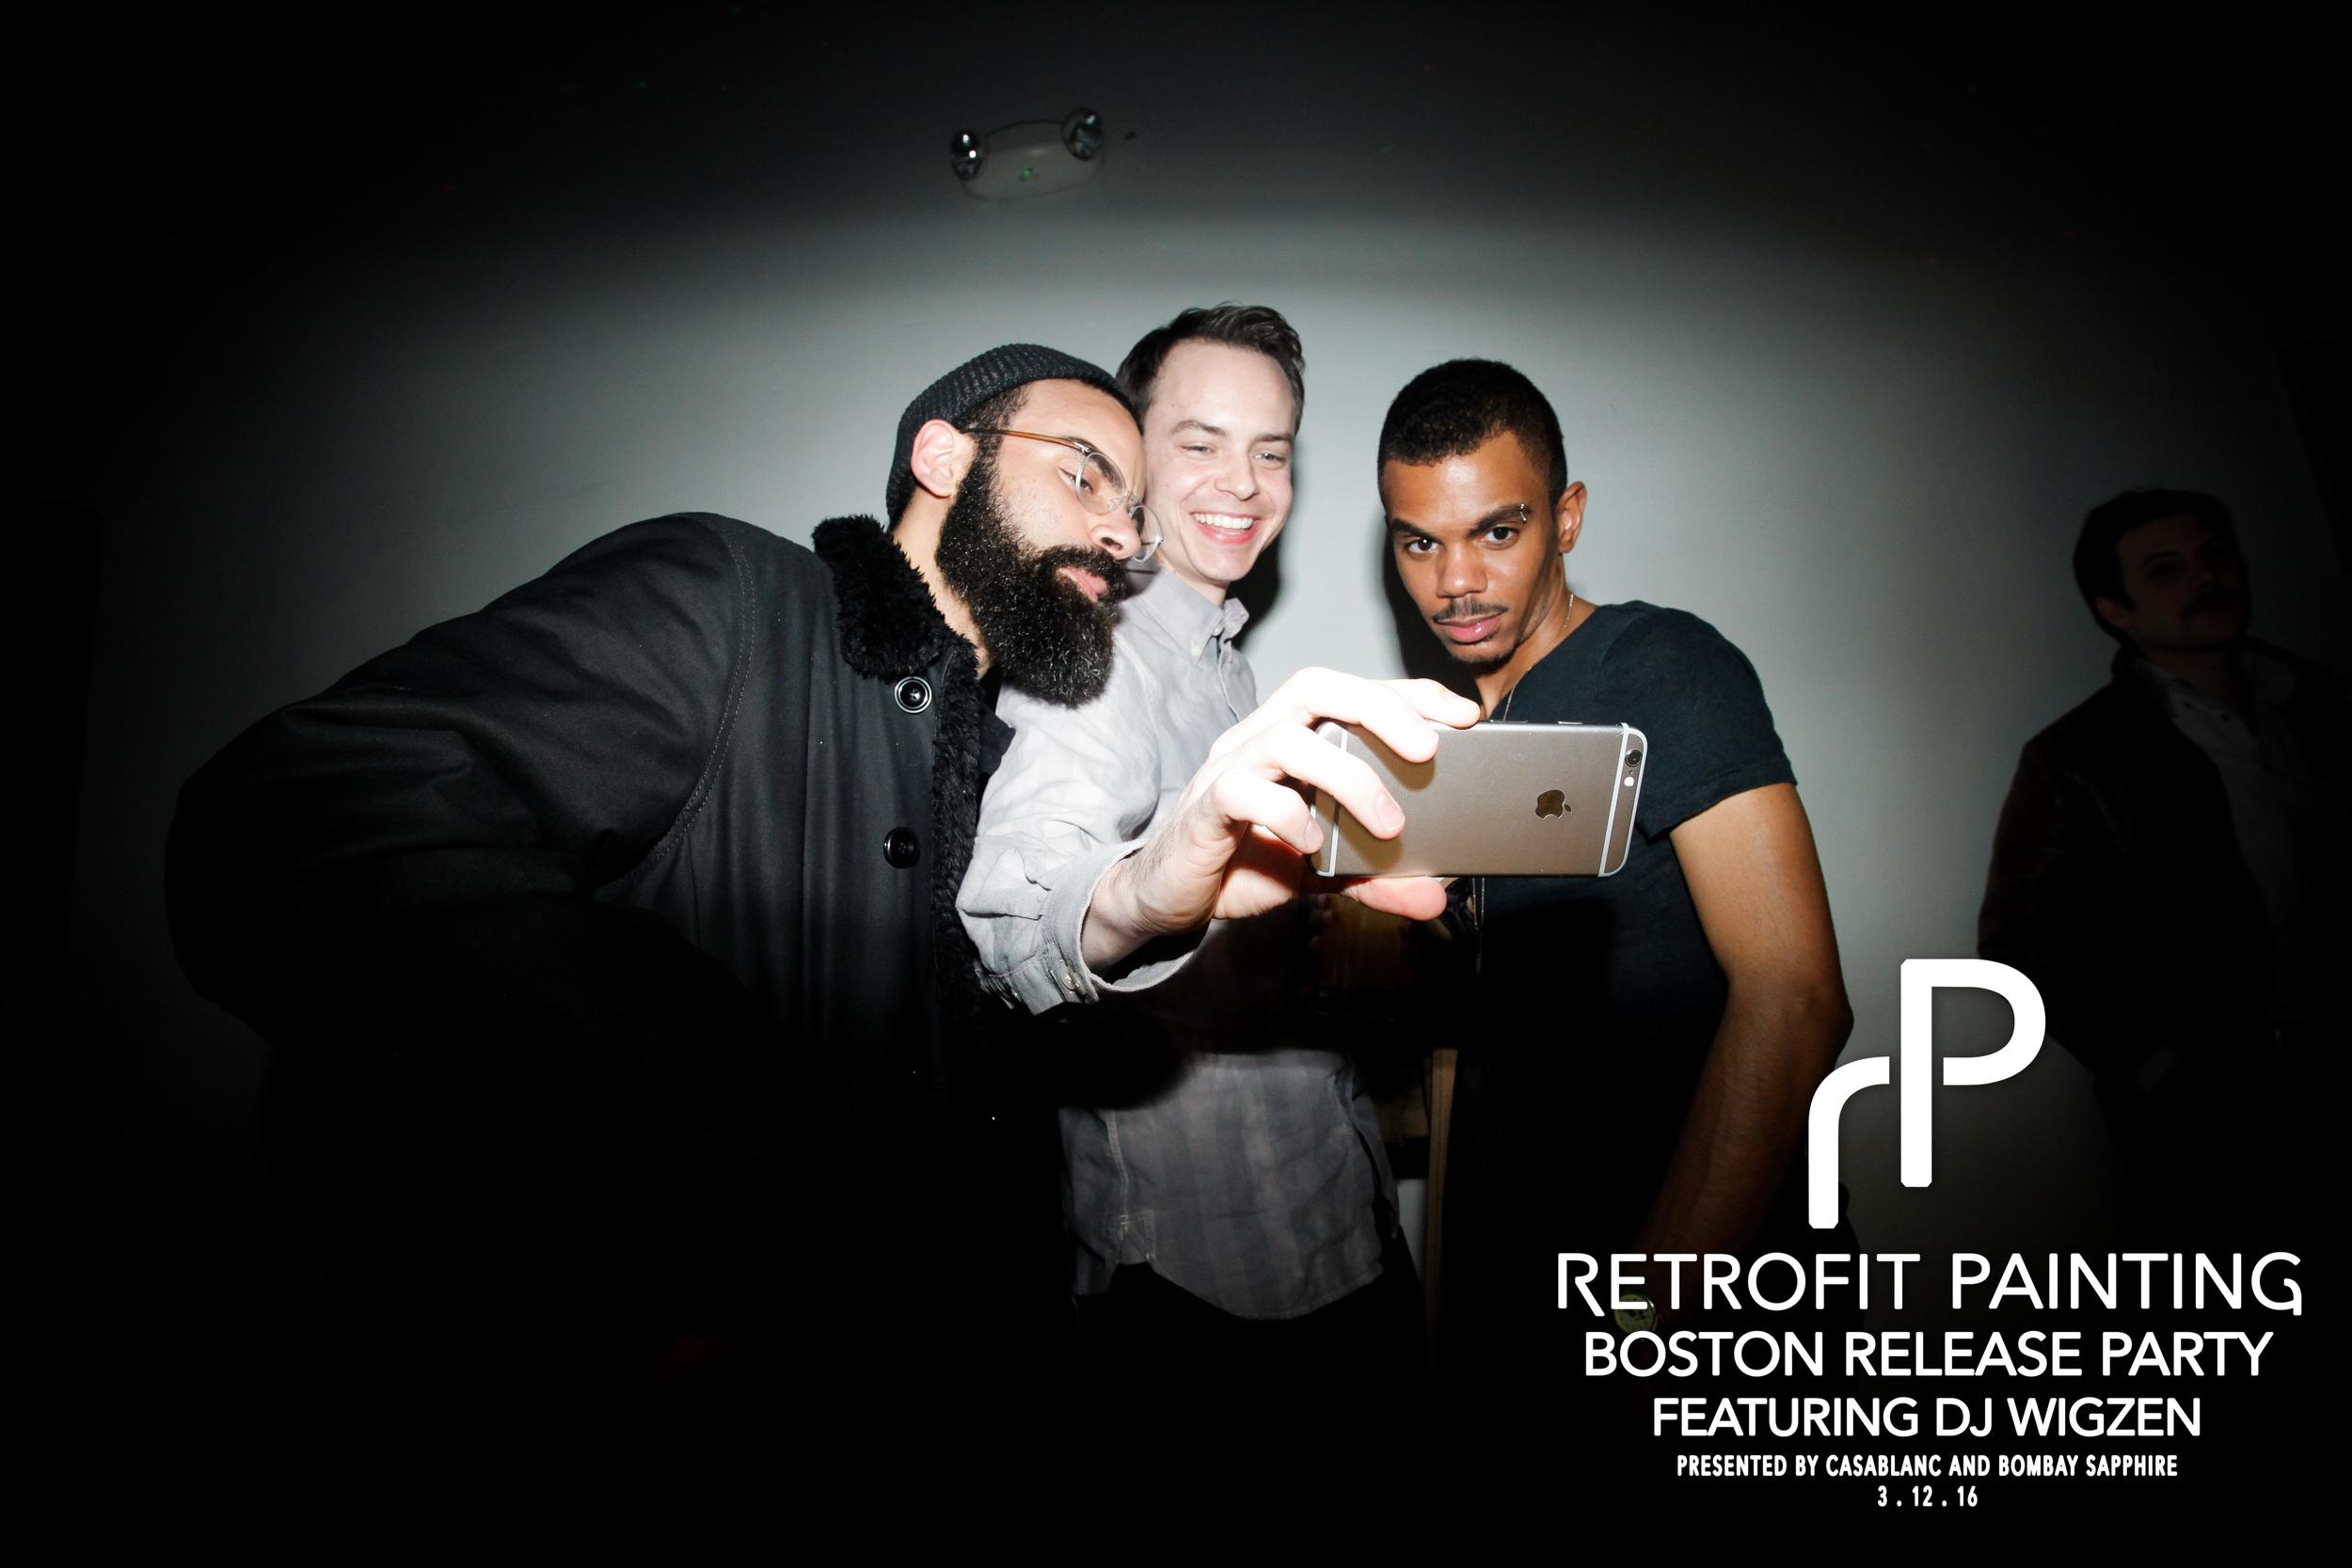 Retrofit Painting Boston Release Party 0147.jpg